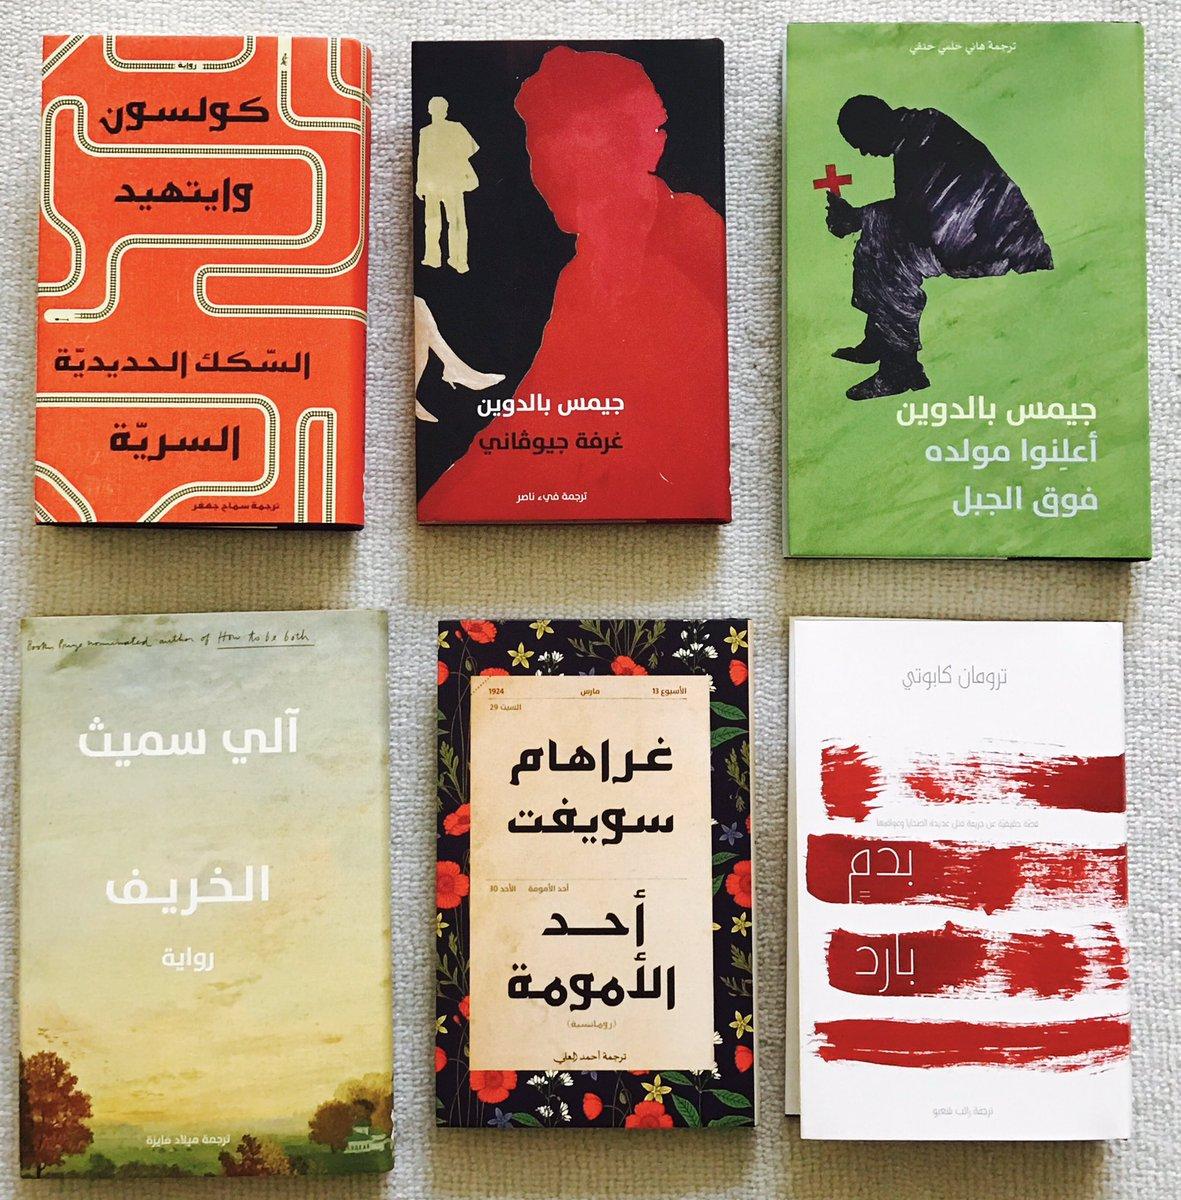 With 'Rewayat,' Sharjah Brings Key World Literature into Arabic, Including James Baldwin, Colson Whitehead